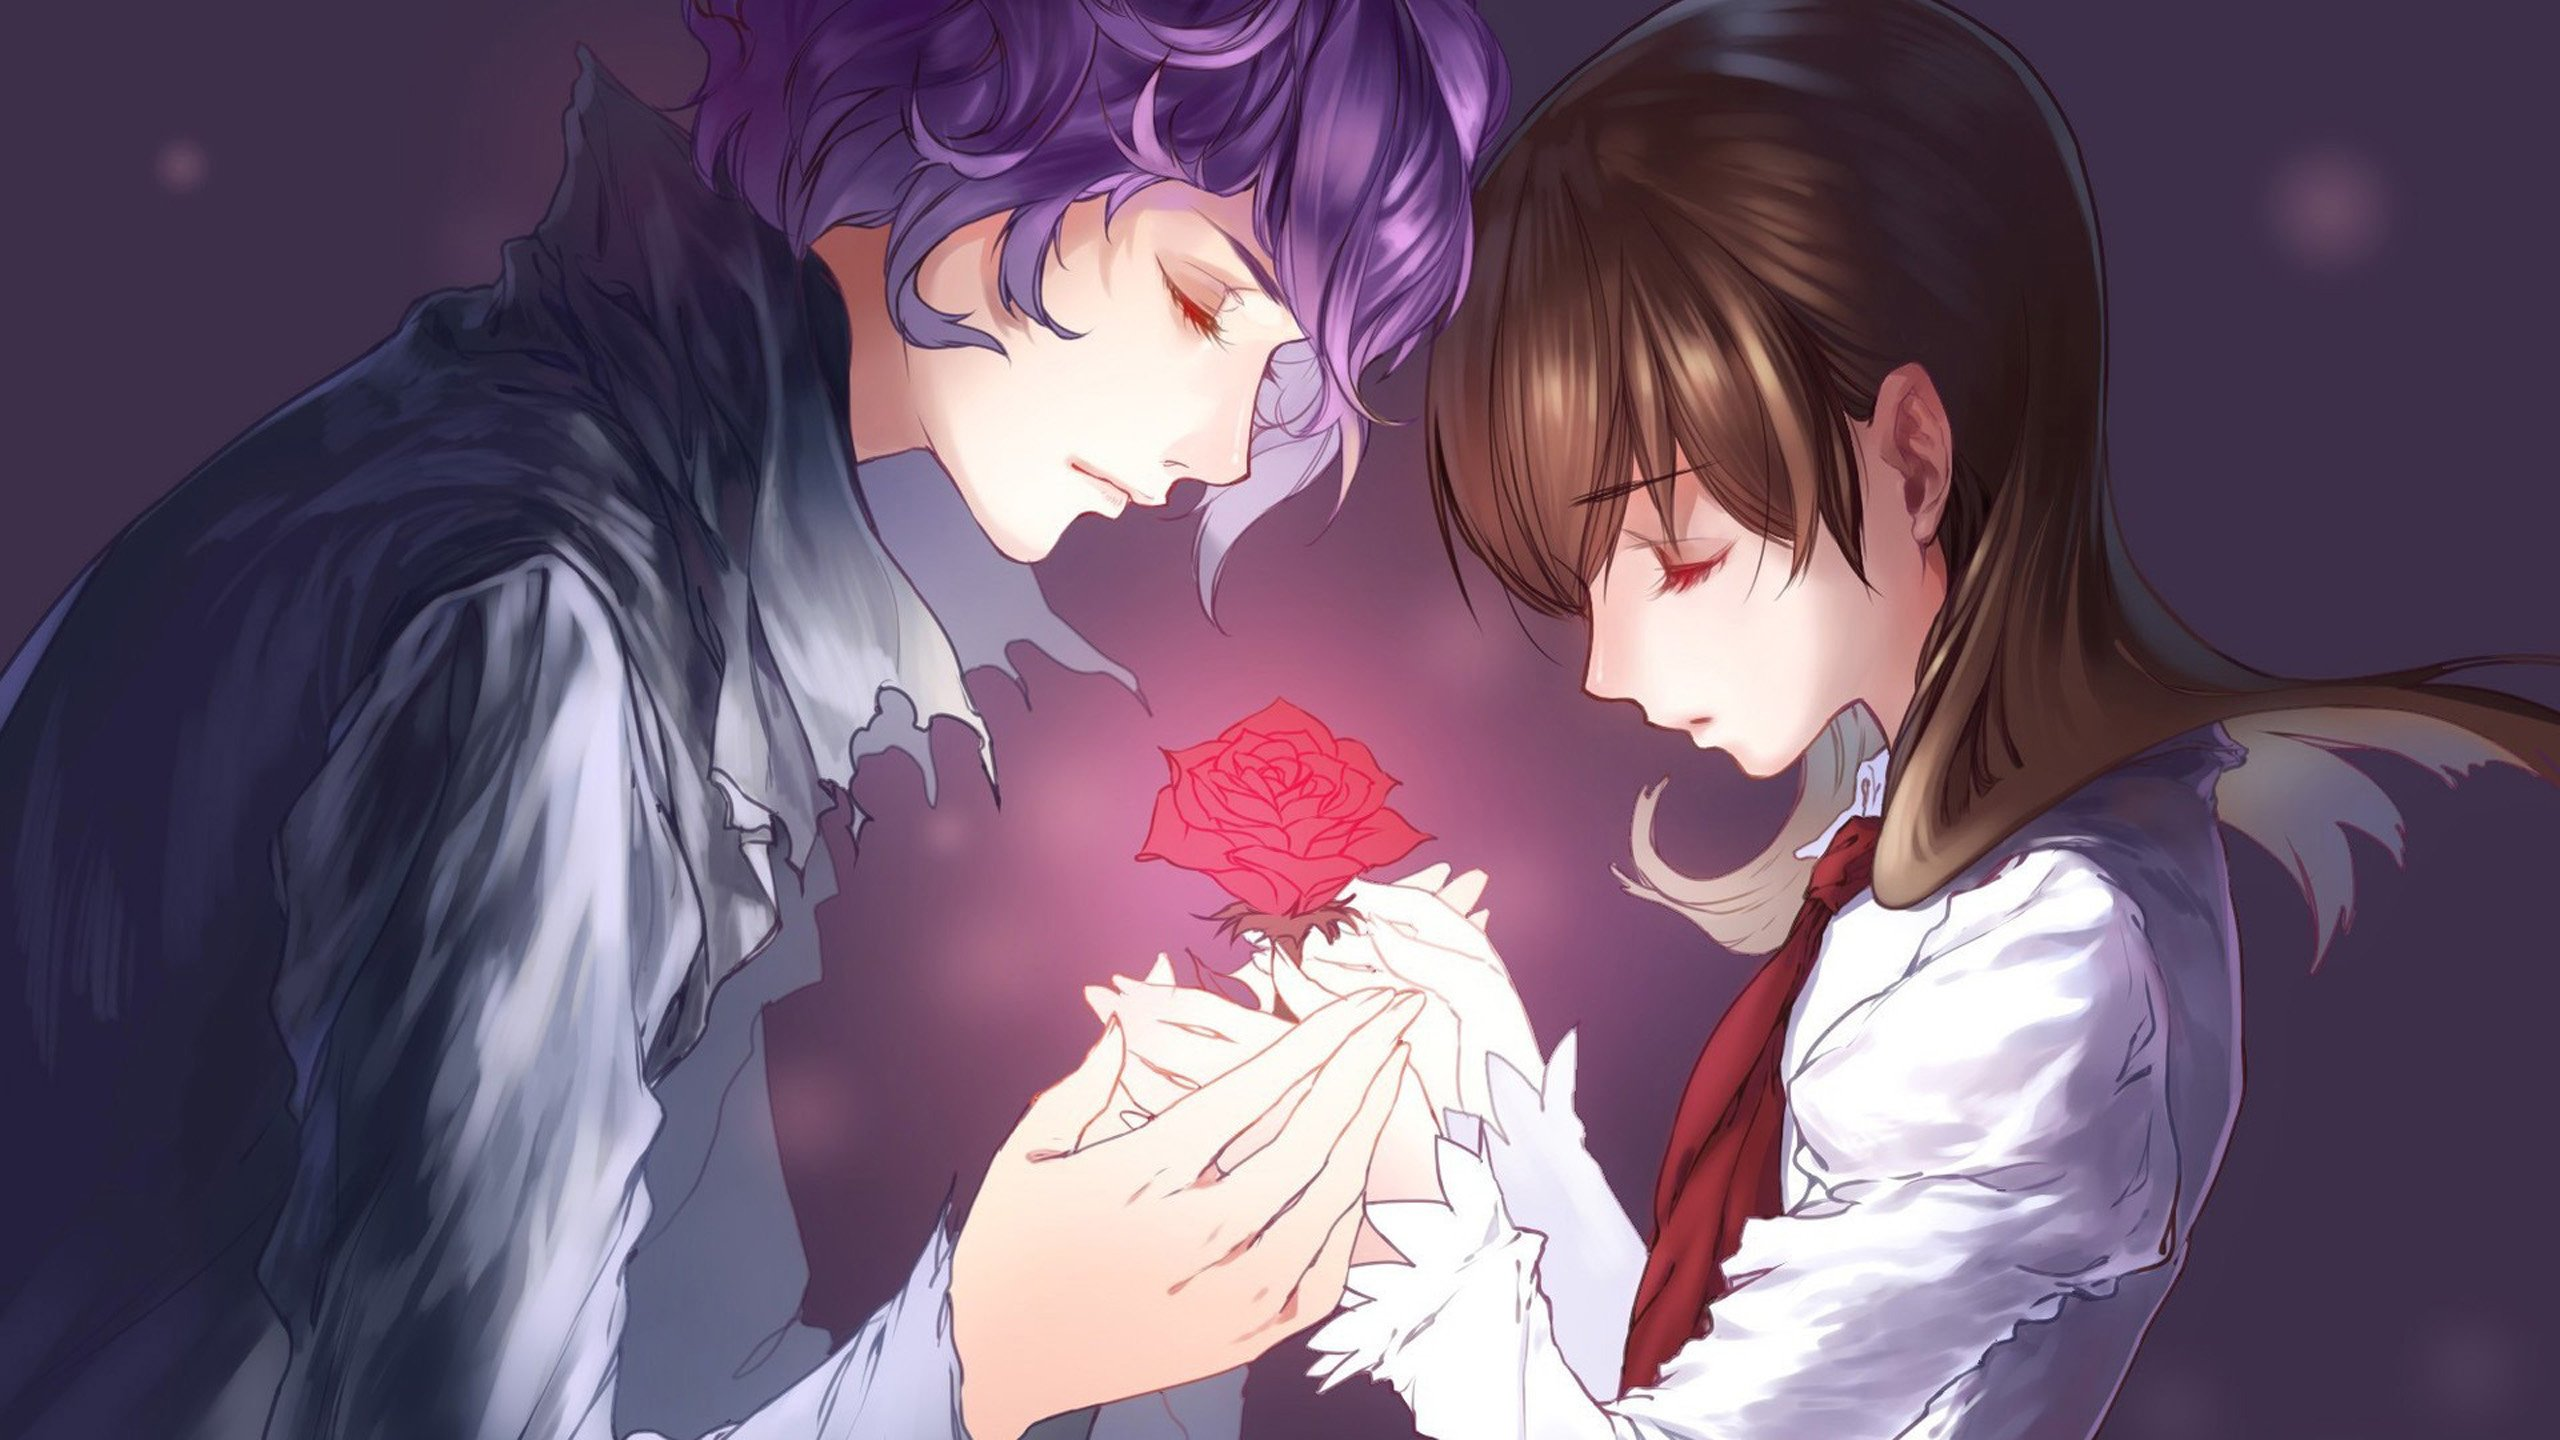 Couple love mood people men women anime fantasy original ... Aphrodite And Ares Anime